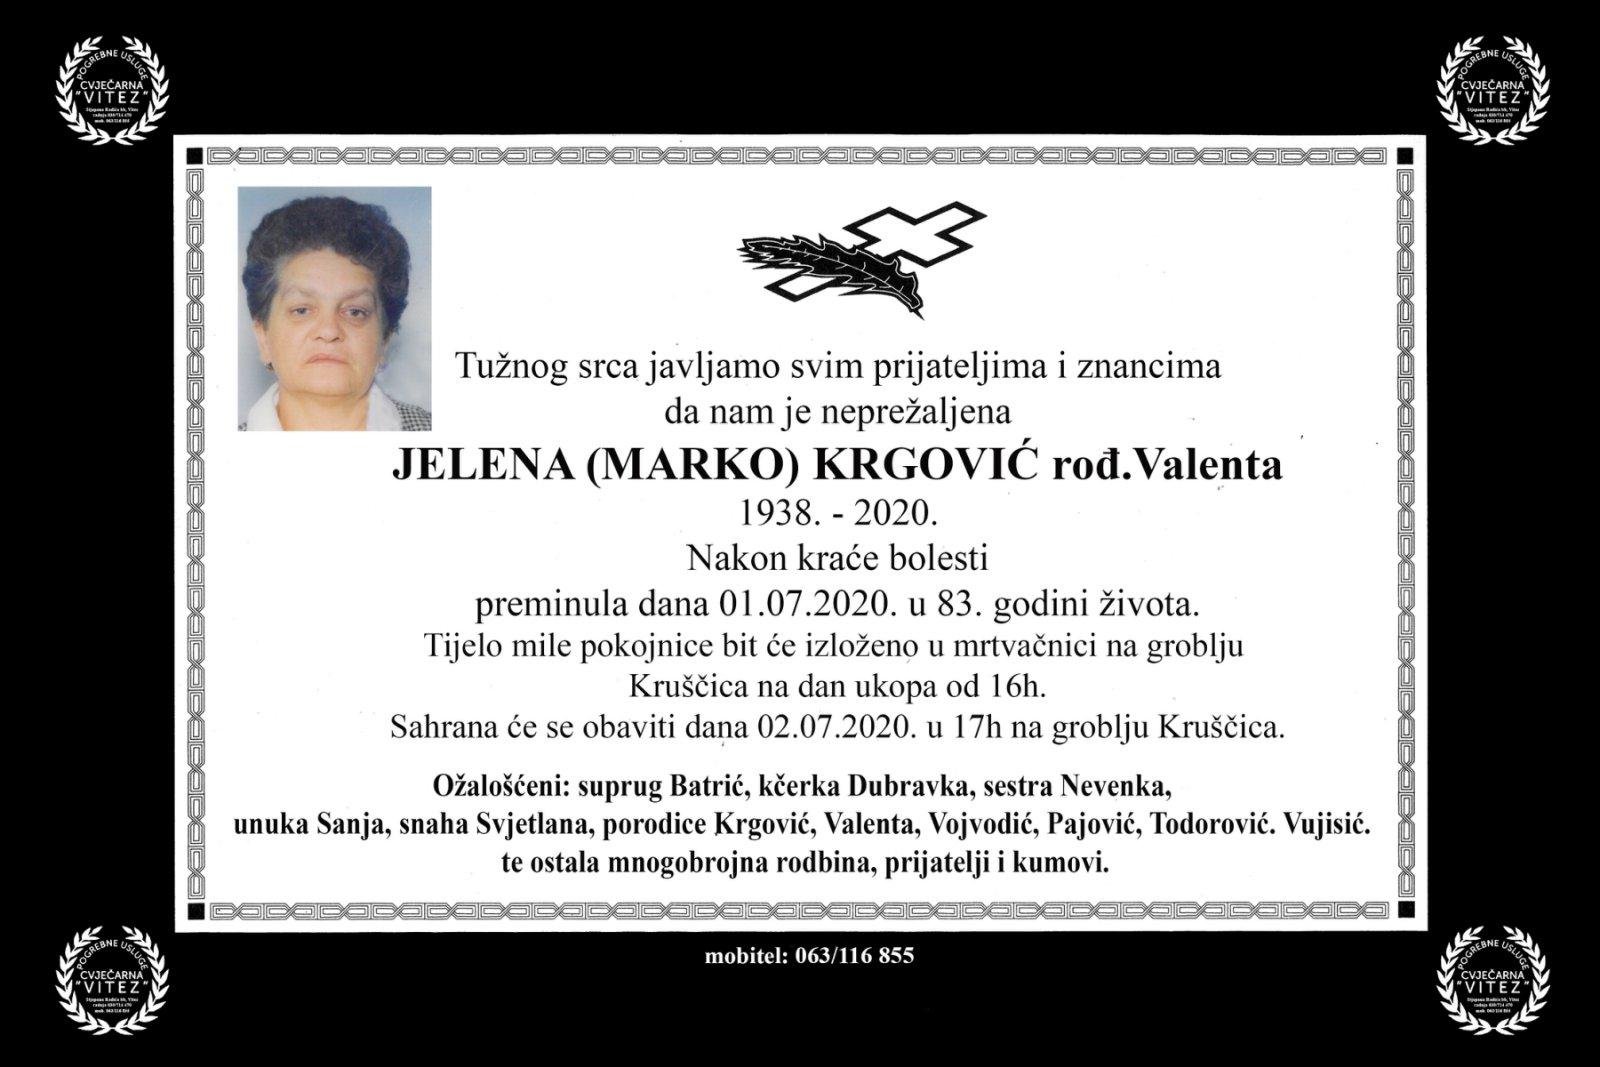 Jelena (Marko) Krgović rođ. Valenta